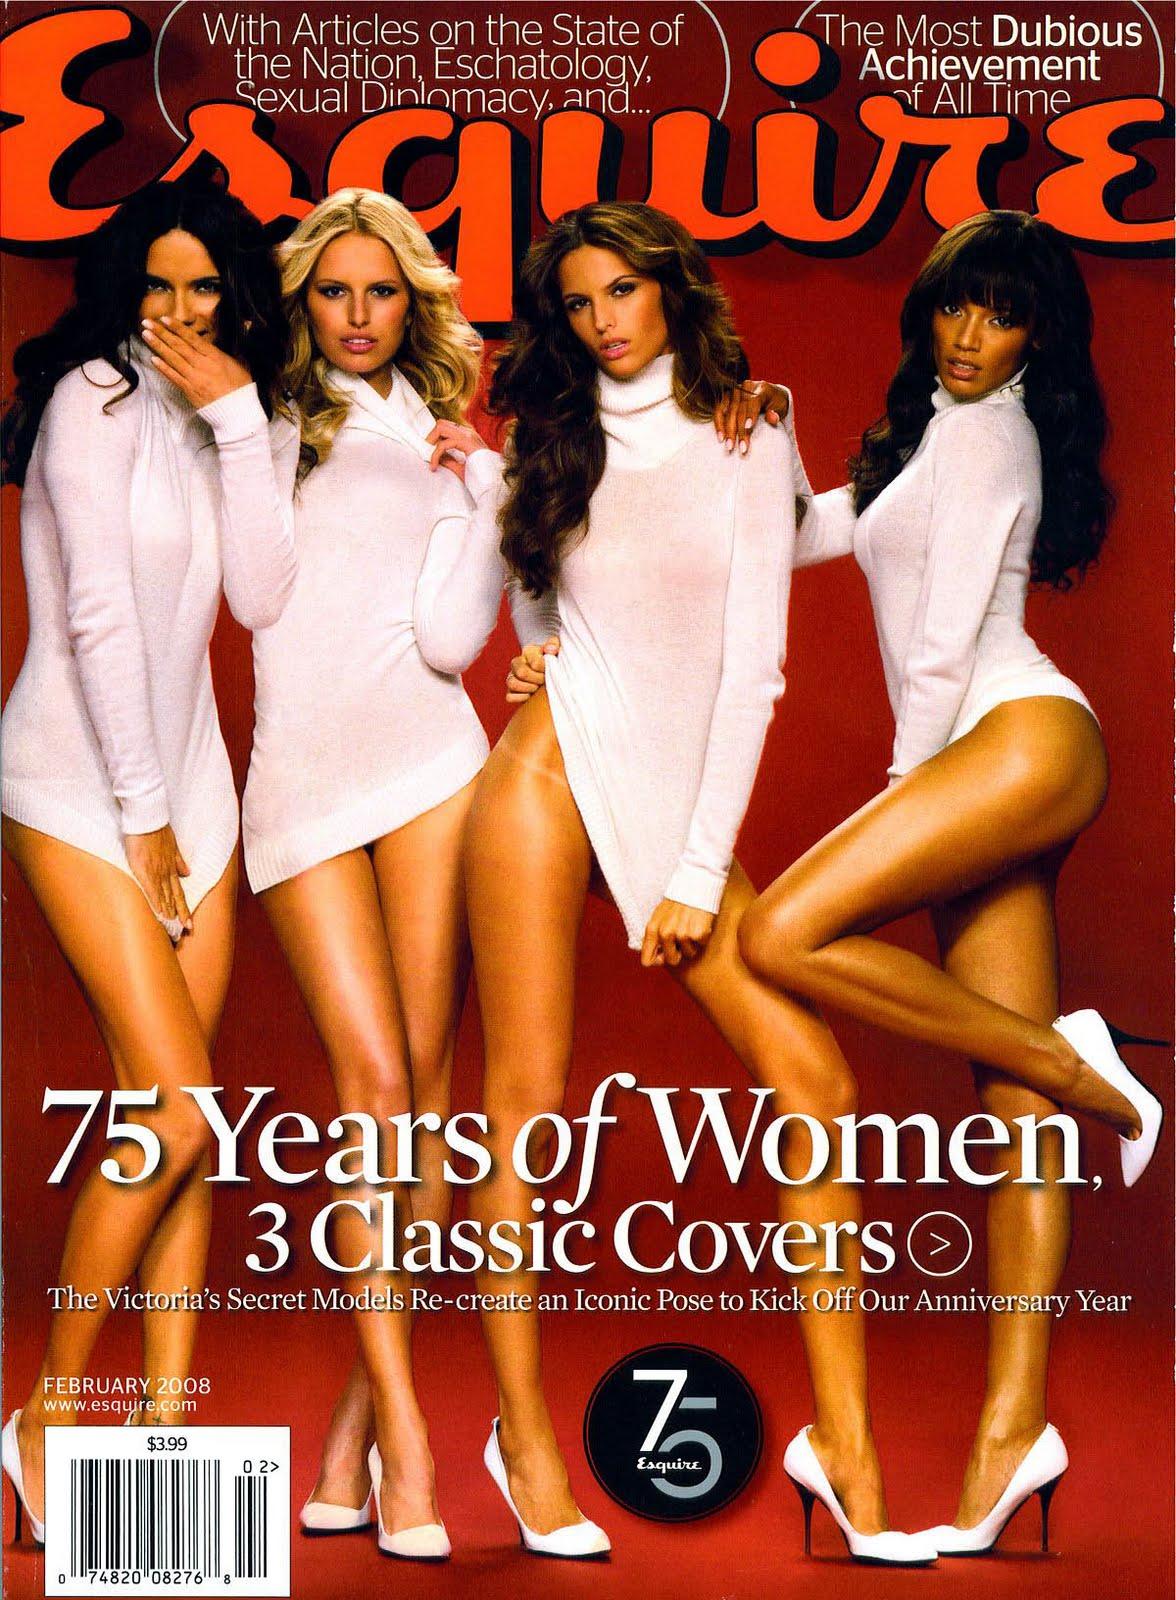 http://1.bp.blogspot.com/_AY5WdaIT6WM/TD_DQl1xTPI/AAAAAAAAO4Y/htl6h_PxGGk/s1600/2008+Victorias+Secret+x+Esquire-770487.jpg